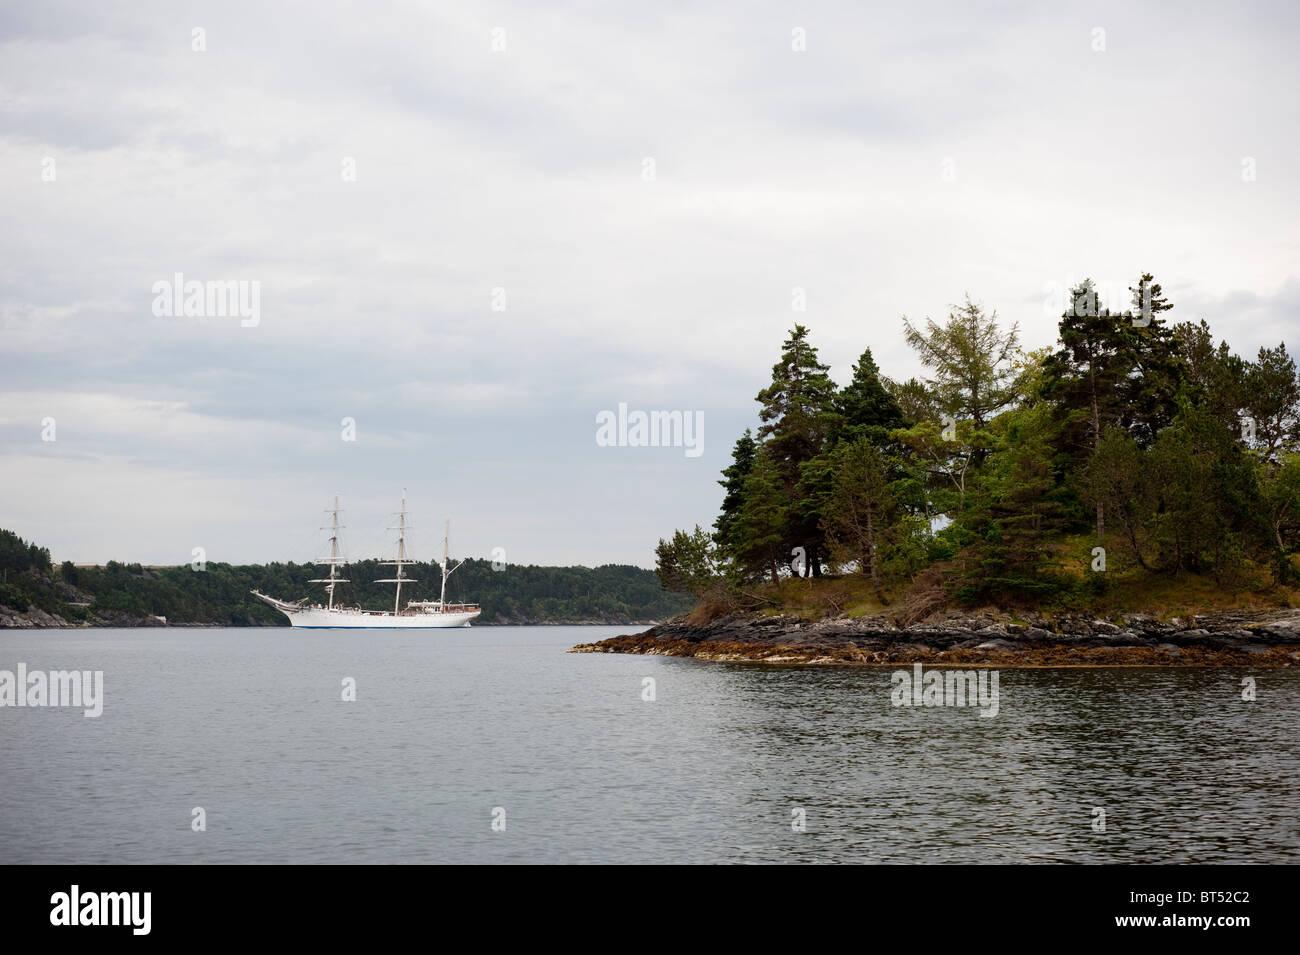 Old sailship in archipelago - Stock Image